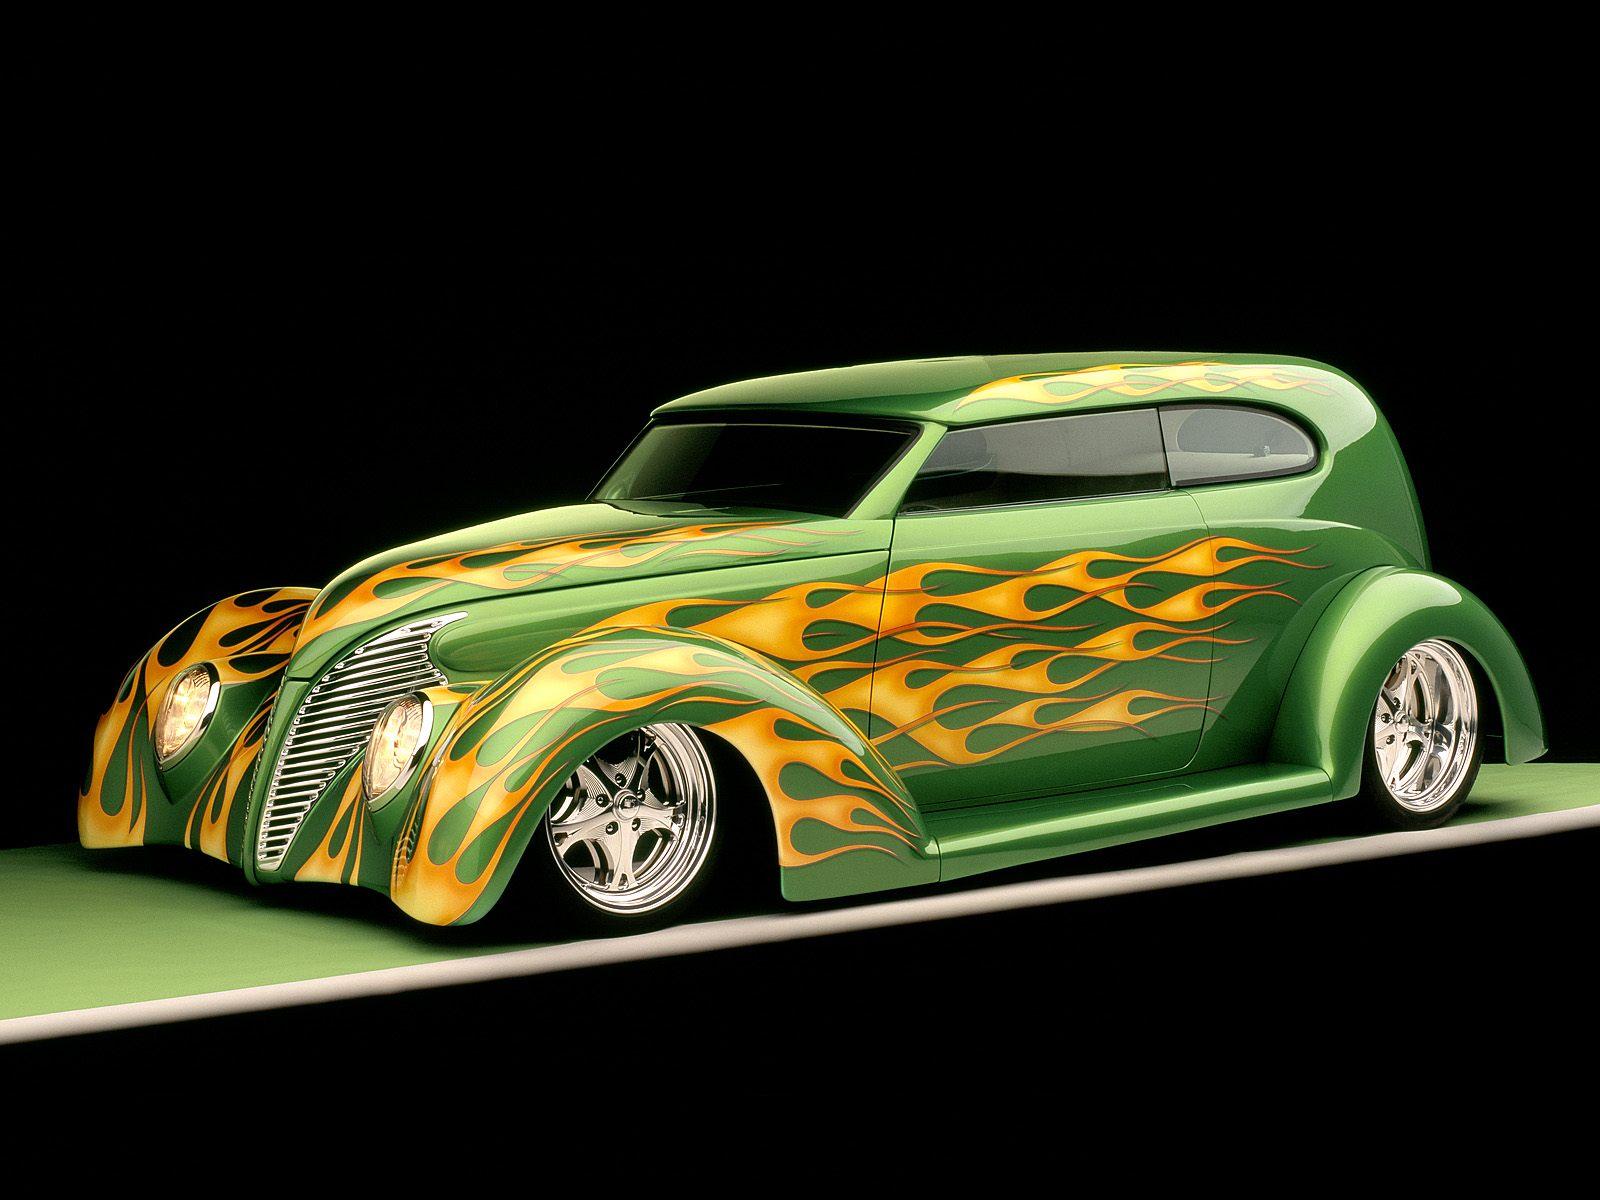 Cars Wallpaper 134, Free Wallpapers, Free Desktop Wallpapers, HD ...